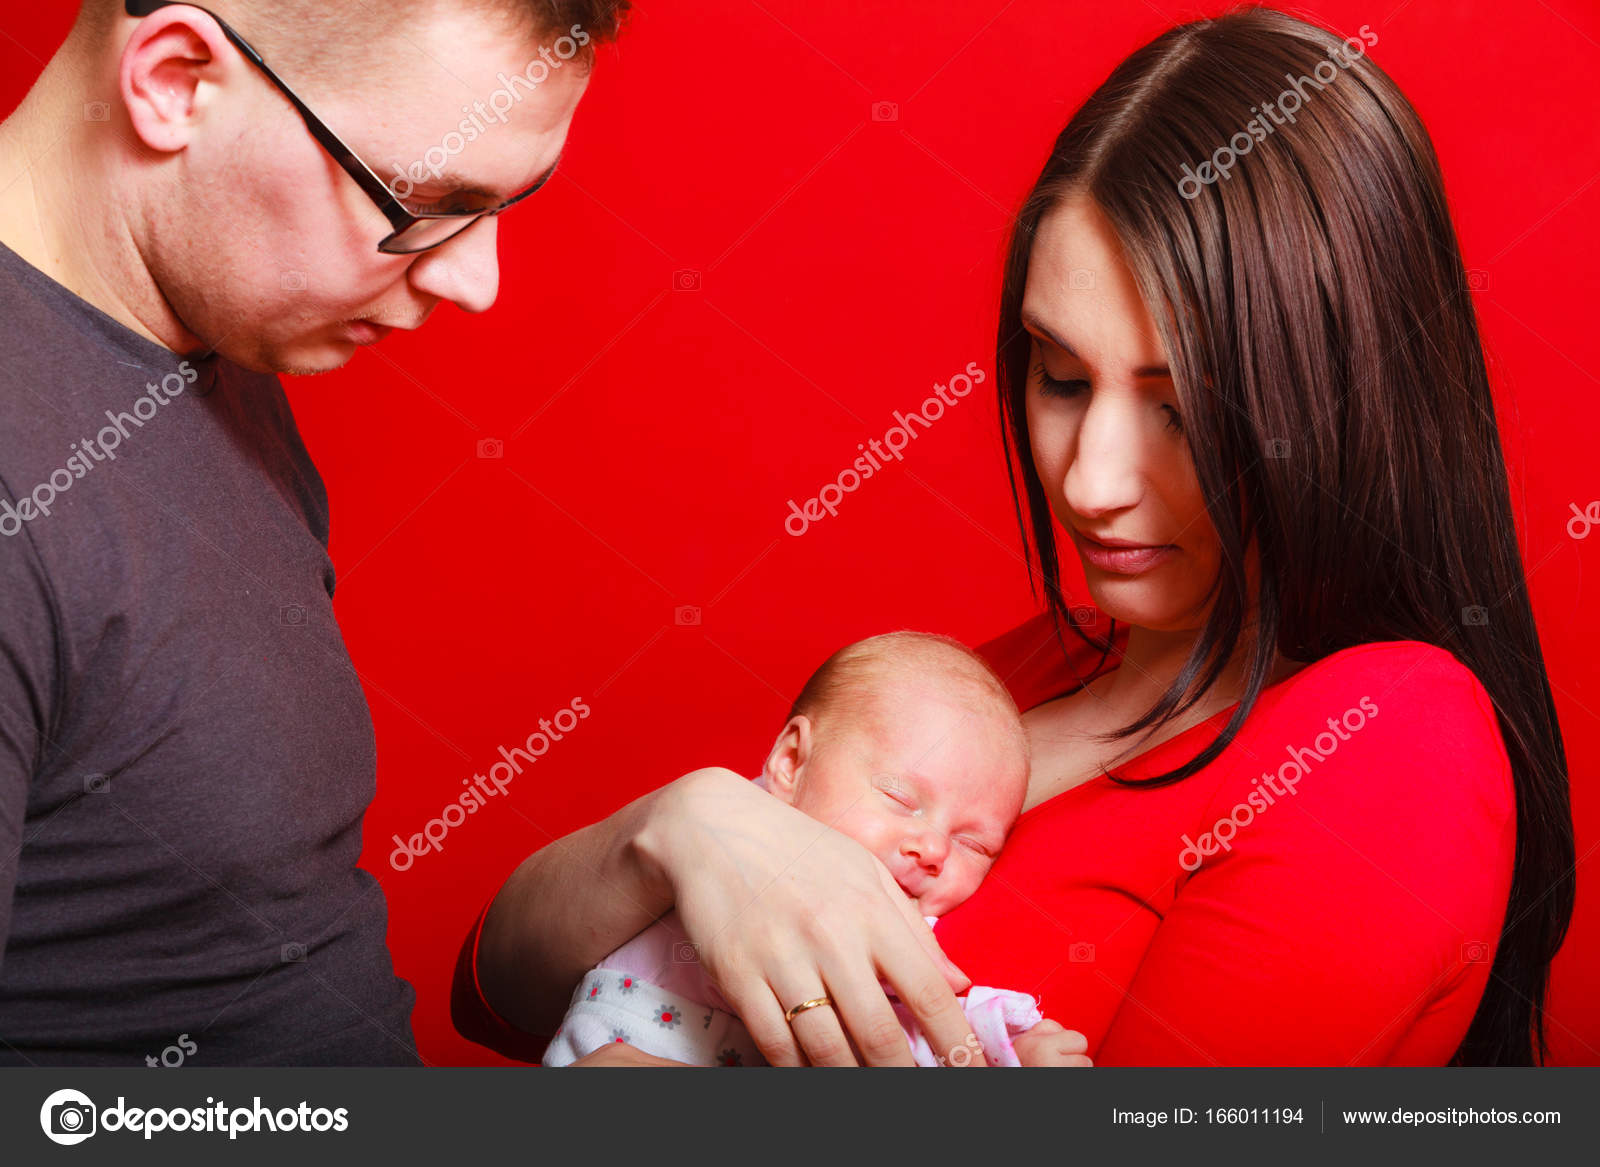 cb16fec71e9 Recién nacido de madre padre pecho junto a ellas — Foto de stock ...